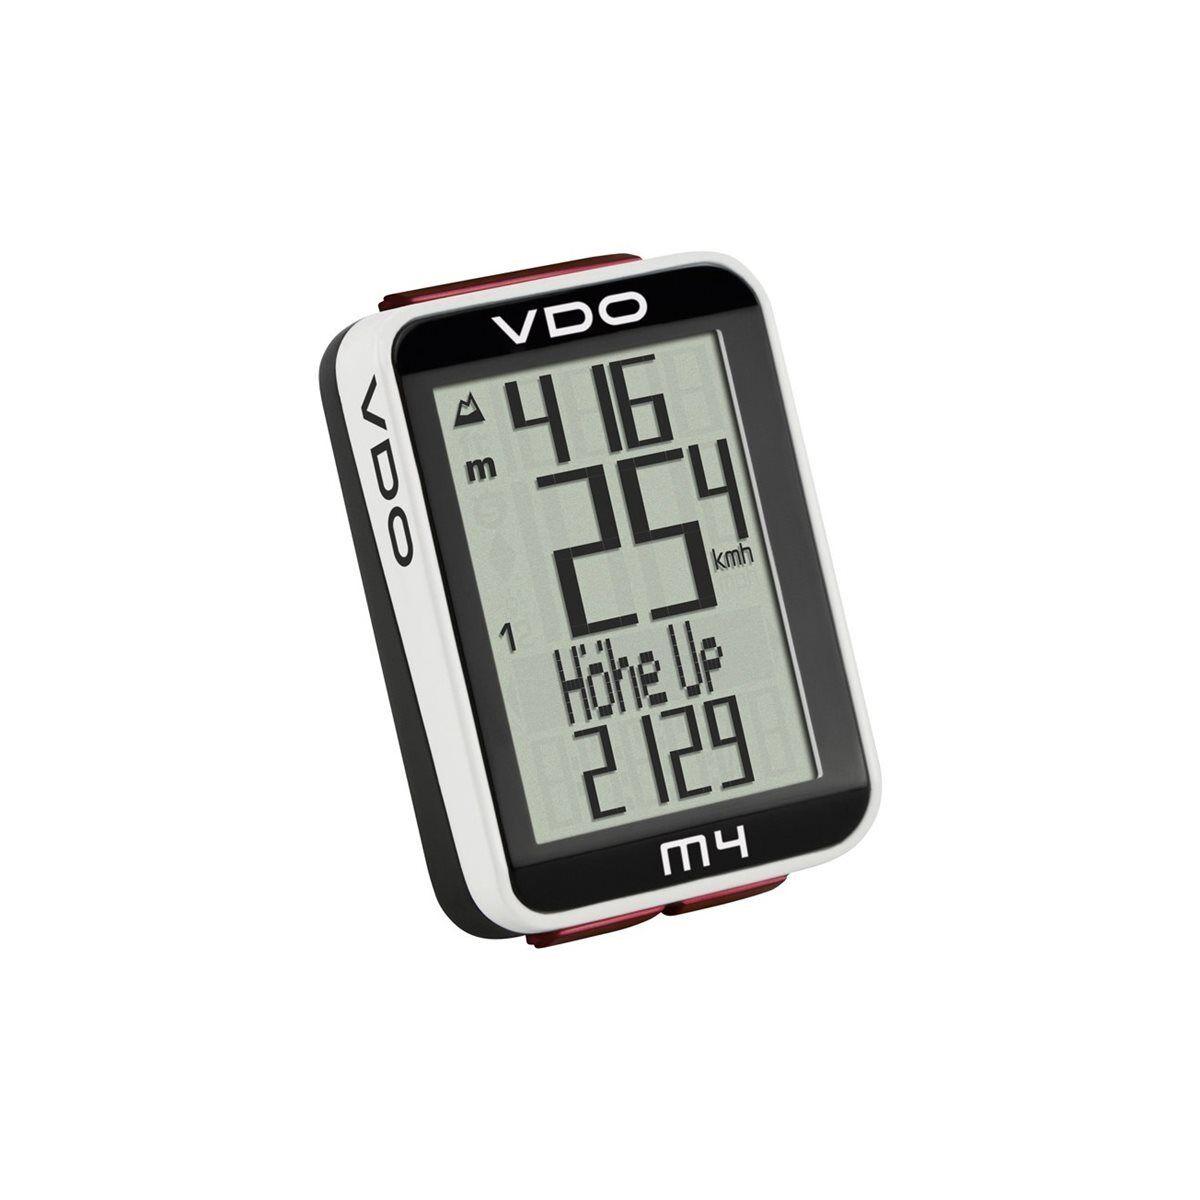 Cyclocomputer m4 wl  30041 VDO bike odometer  offering 100%